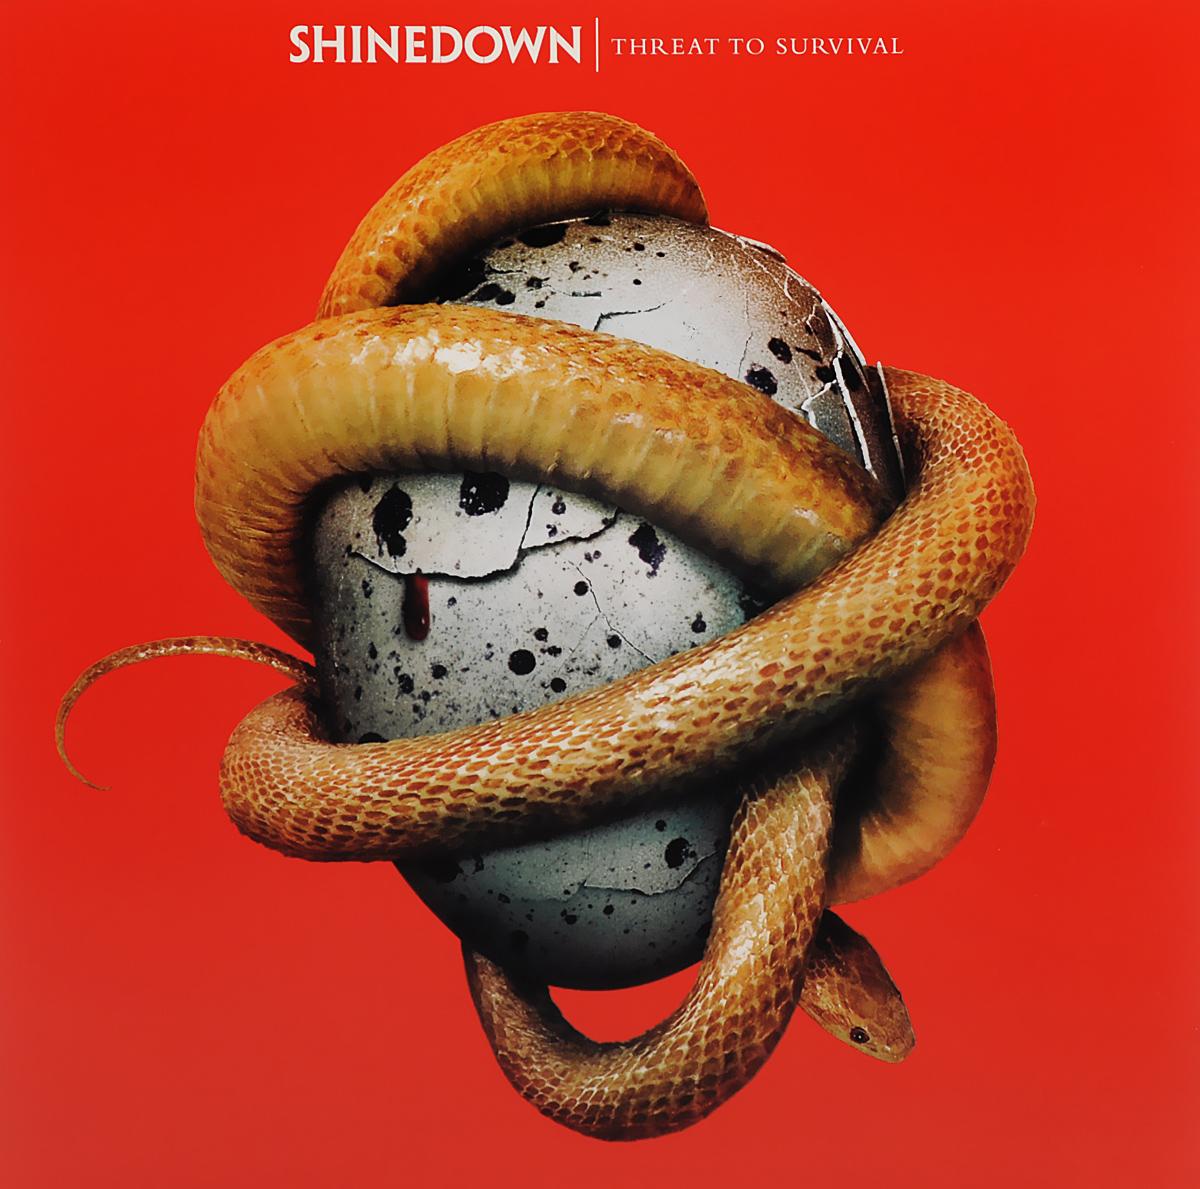 цена на Shinedown Shinedown. Threat To Survival (LP + CD)